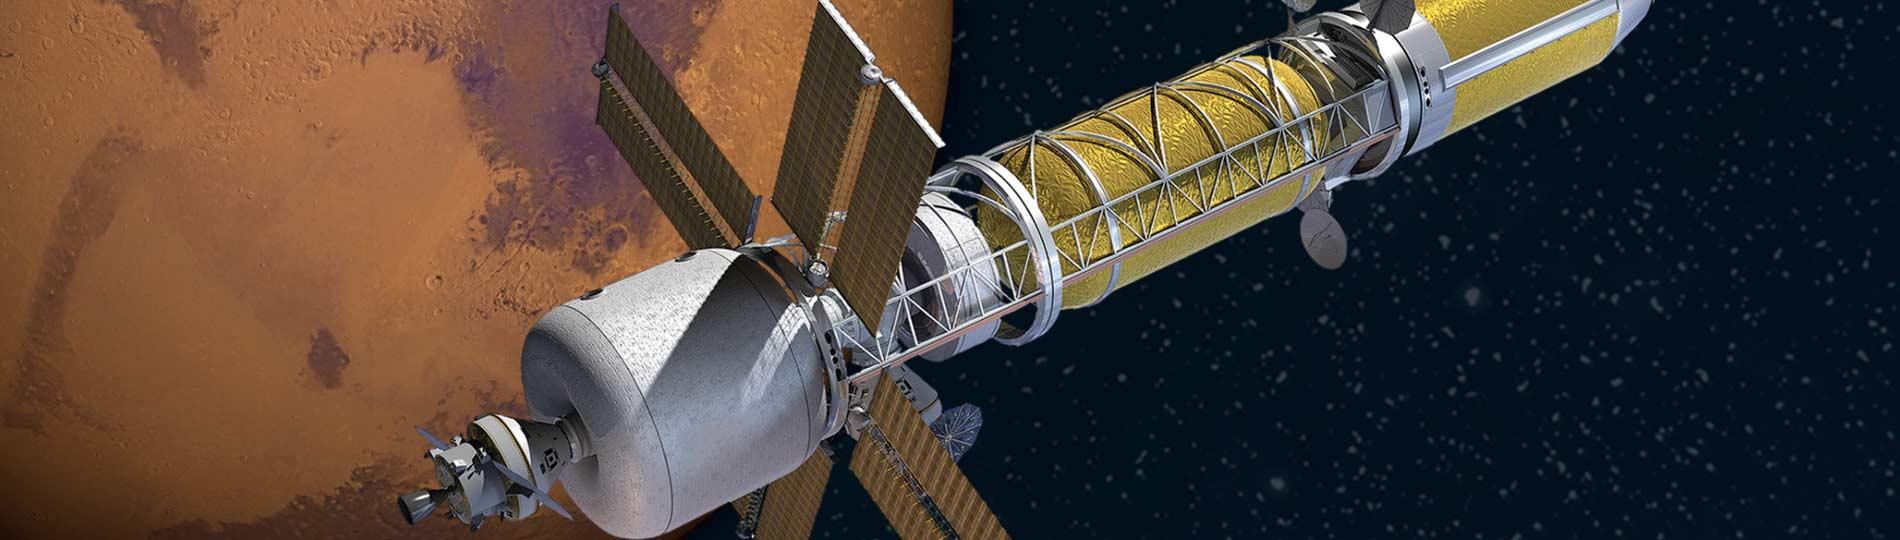 NASA is bringing back cold war-era atomic rockets to get to Mars